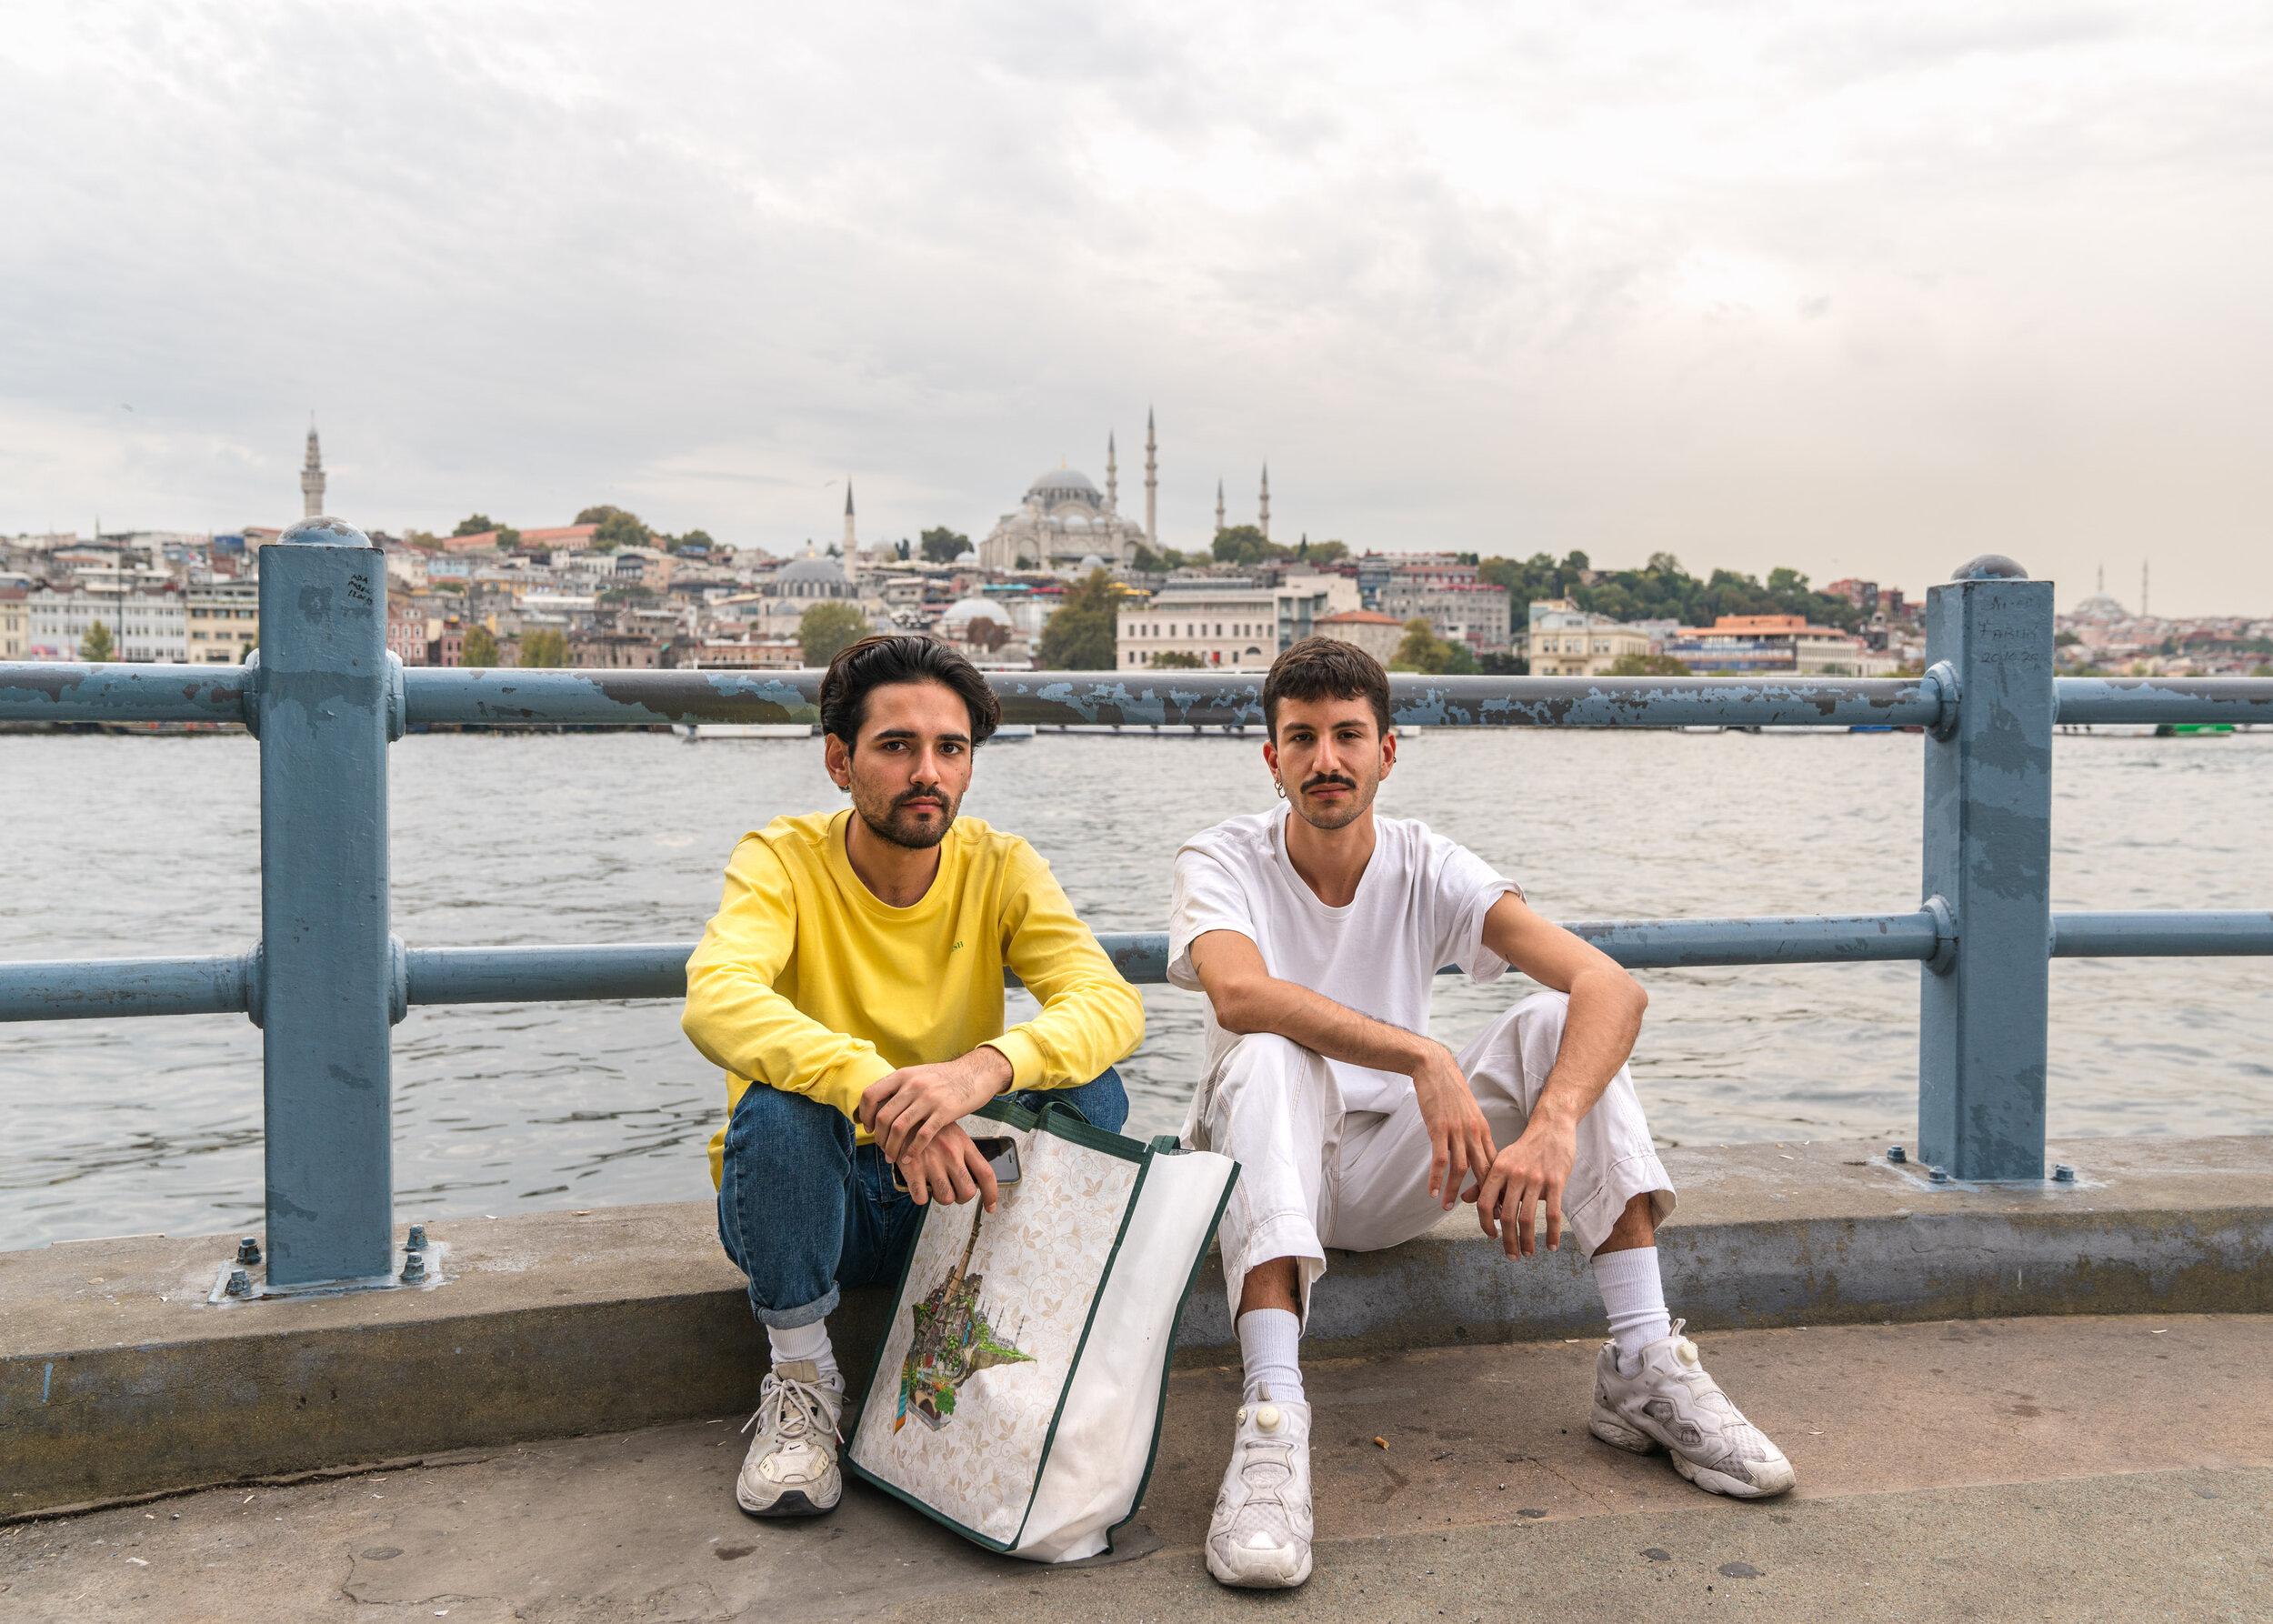 Two men sit chatting under the Galata Köprüsü bridge, Istanbul. Turkey 2019